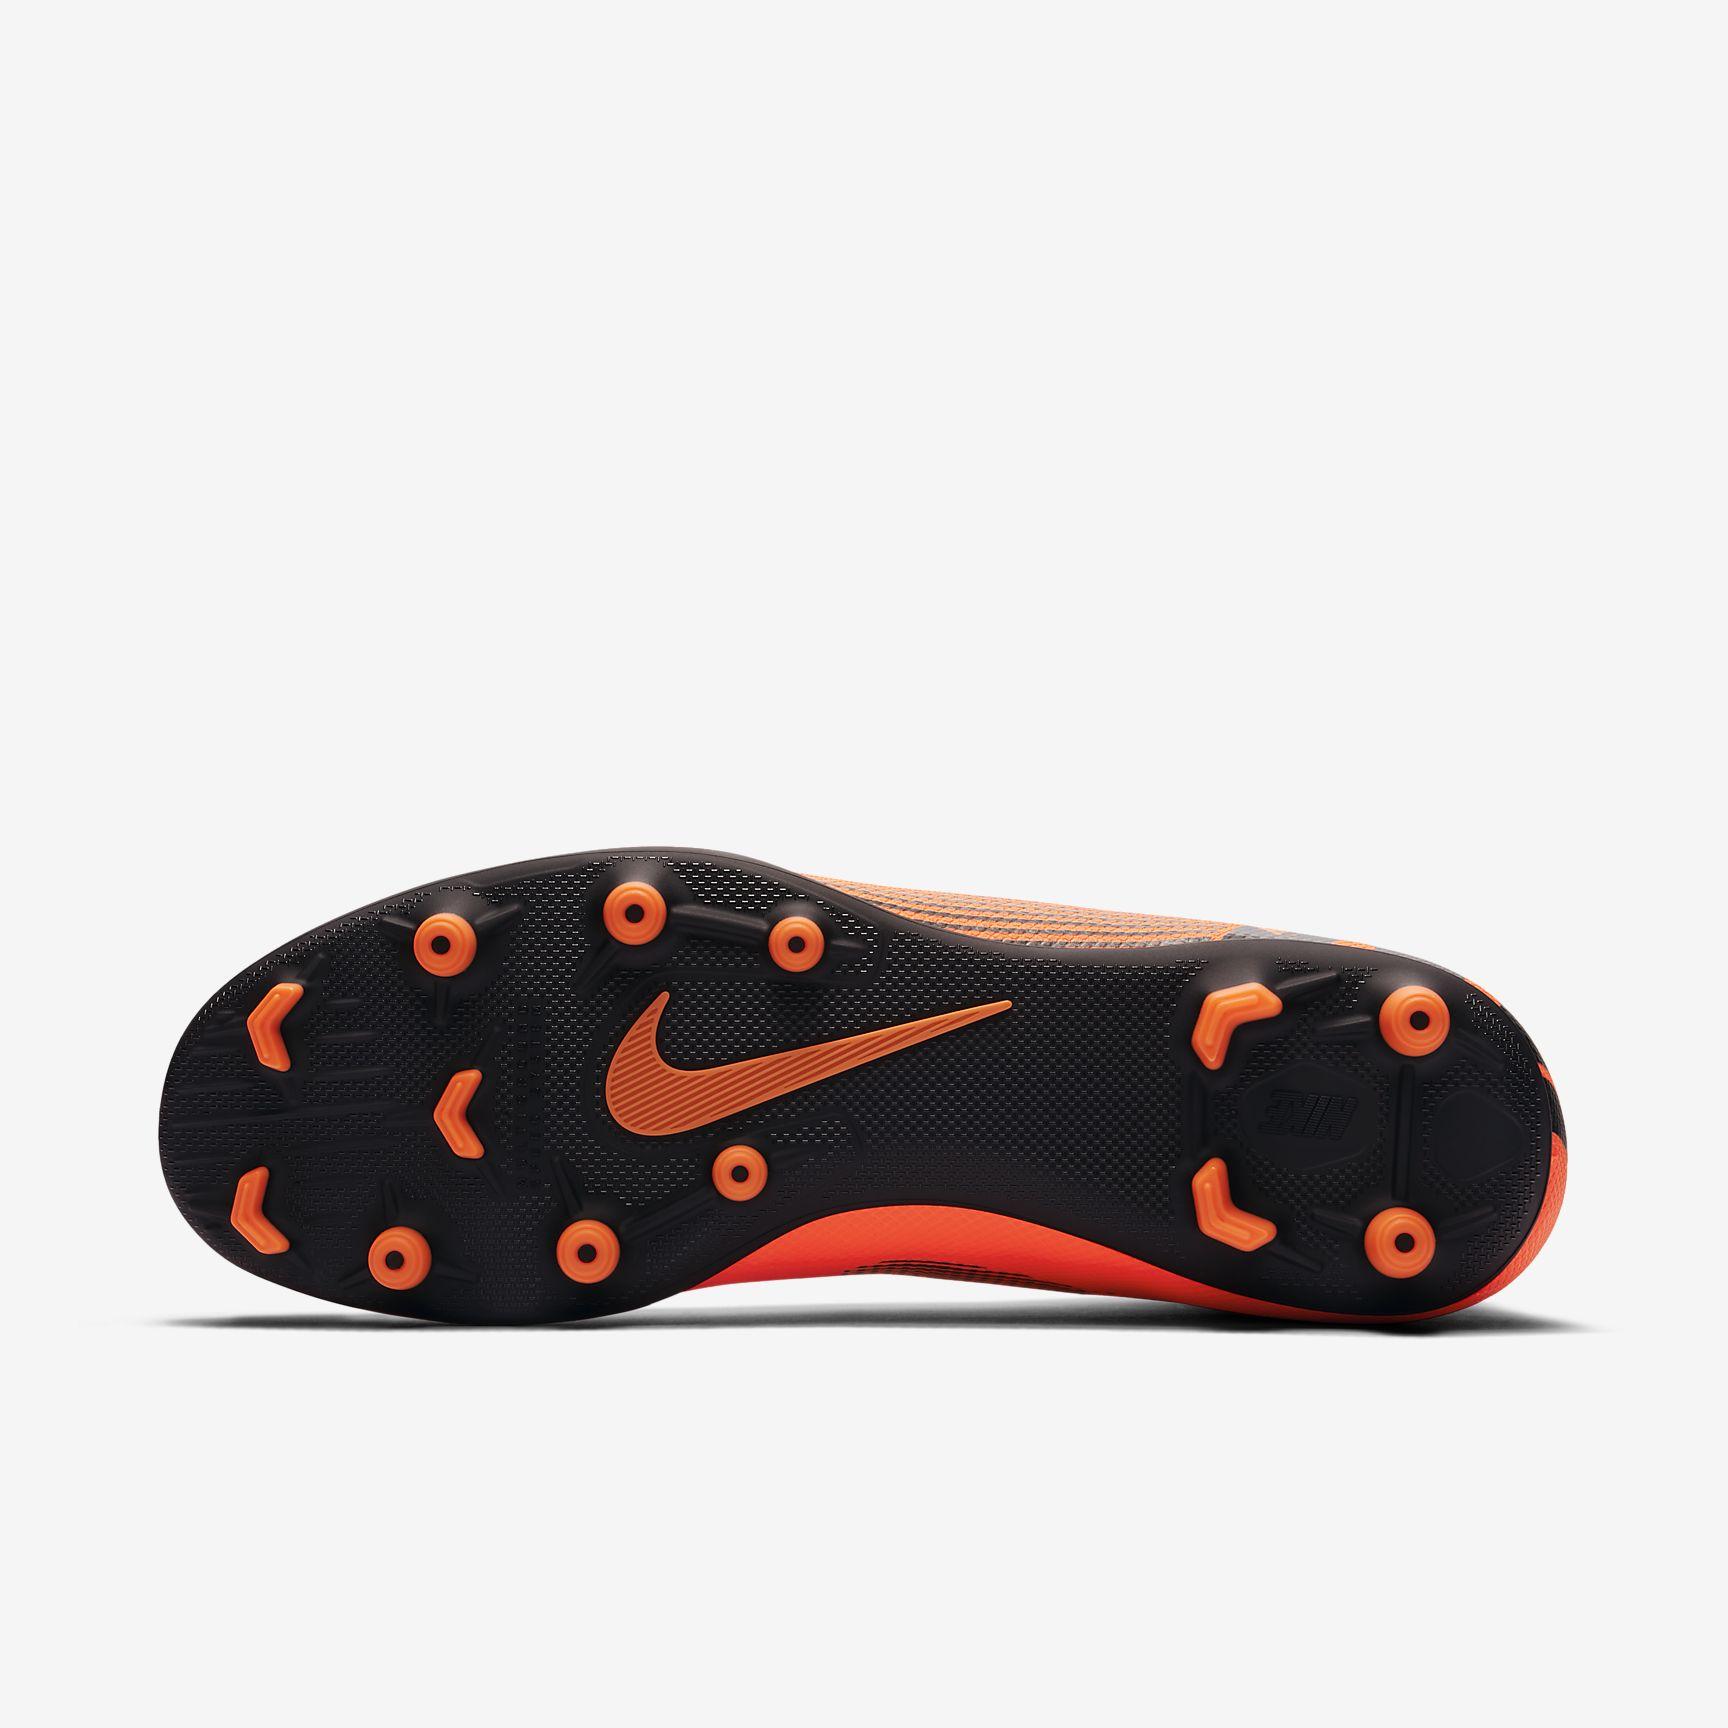 chaussures-football-Nike-Mercurial-Superfly-VI-Club-img2